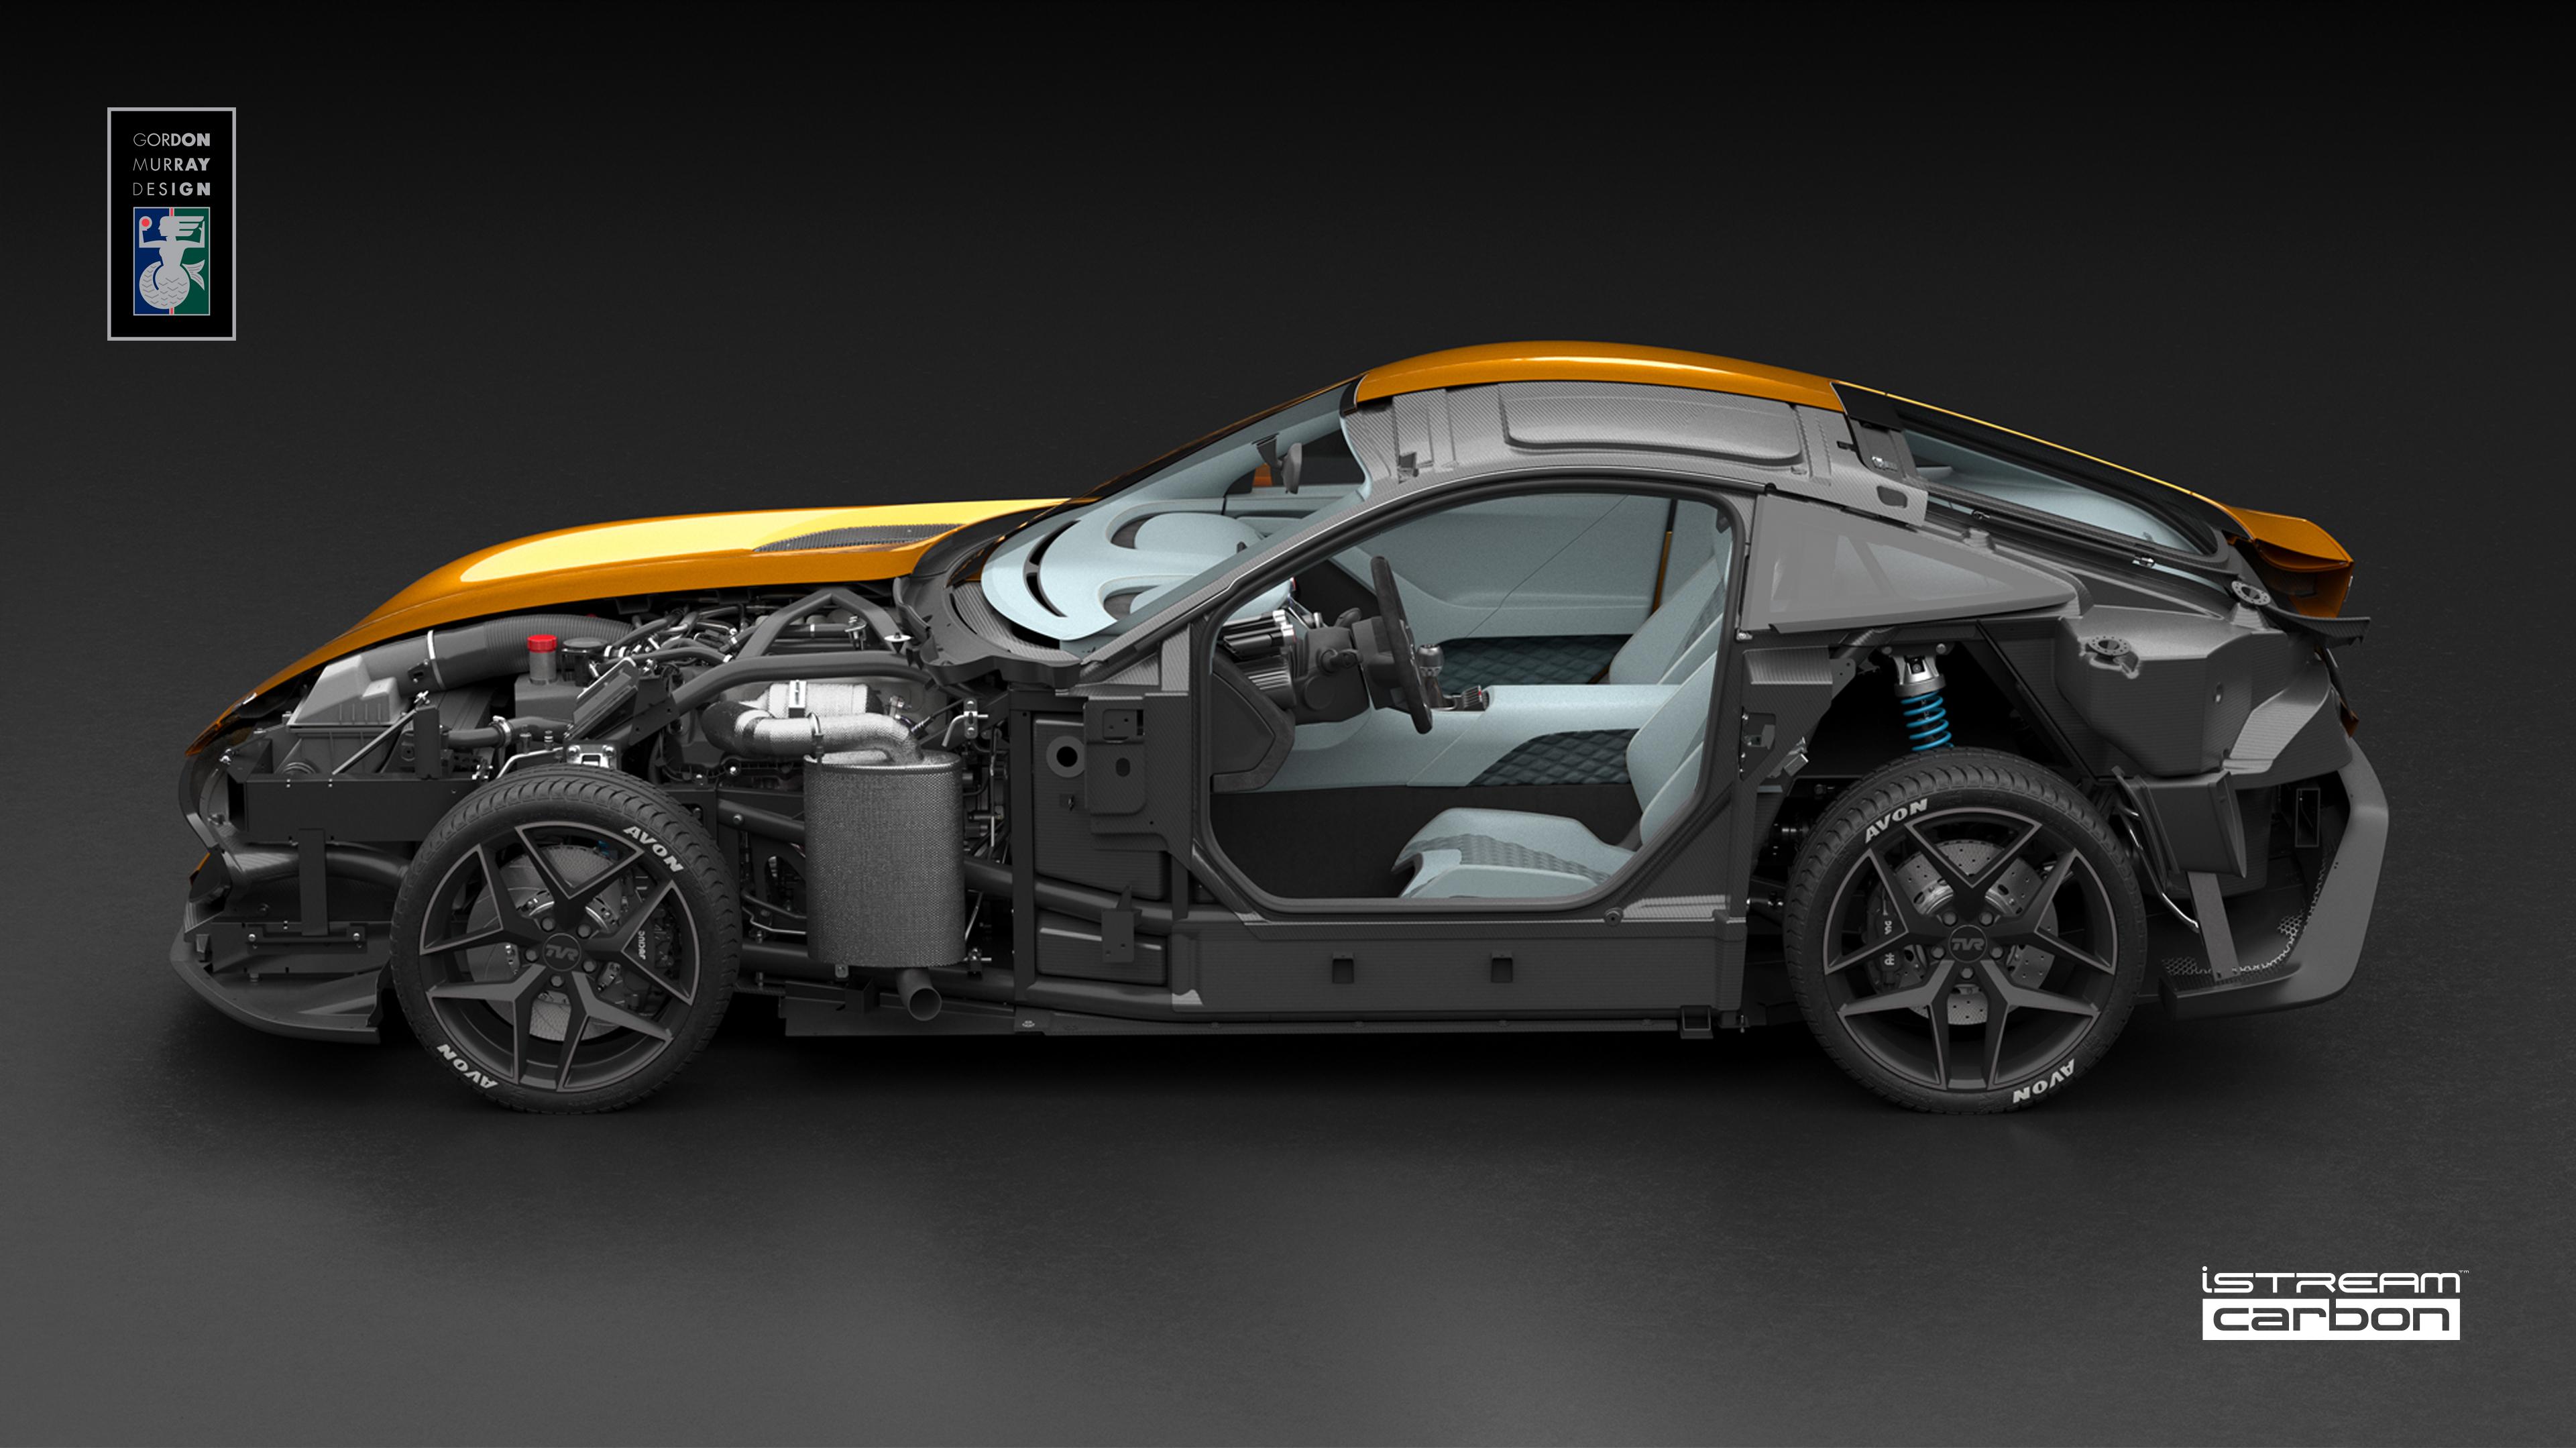 mclaren f1 designer gordon murray creates his own car